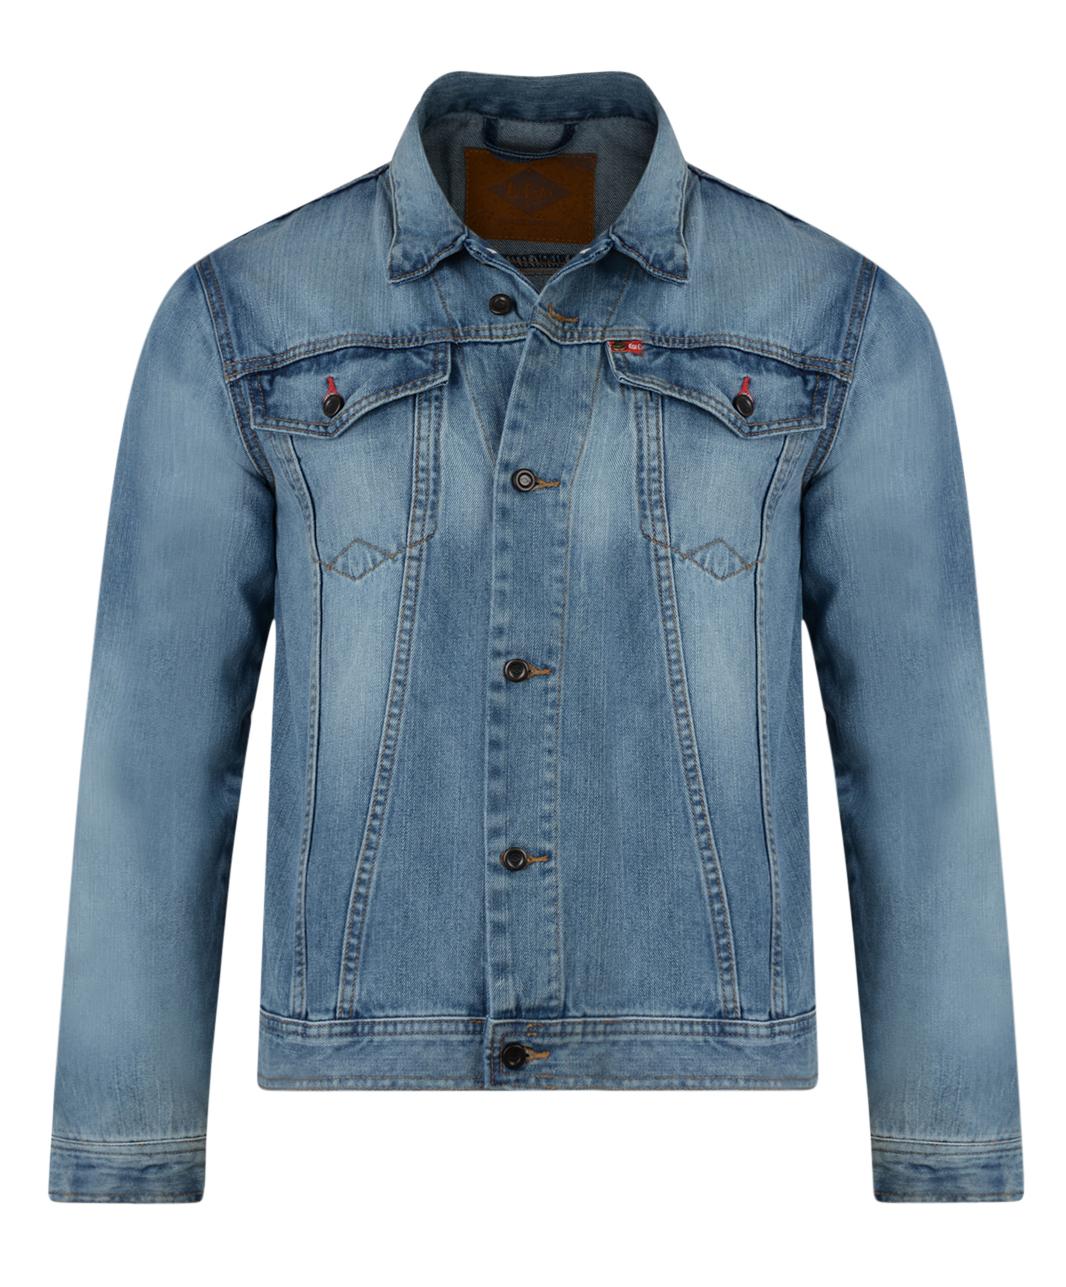 Lee Cooper New Mens Denim Jacket Vintage Light Blue Retro Trucker Jean Jackets | eBay